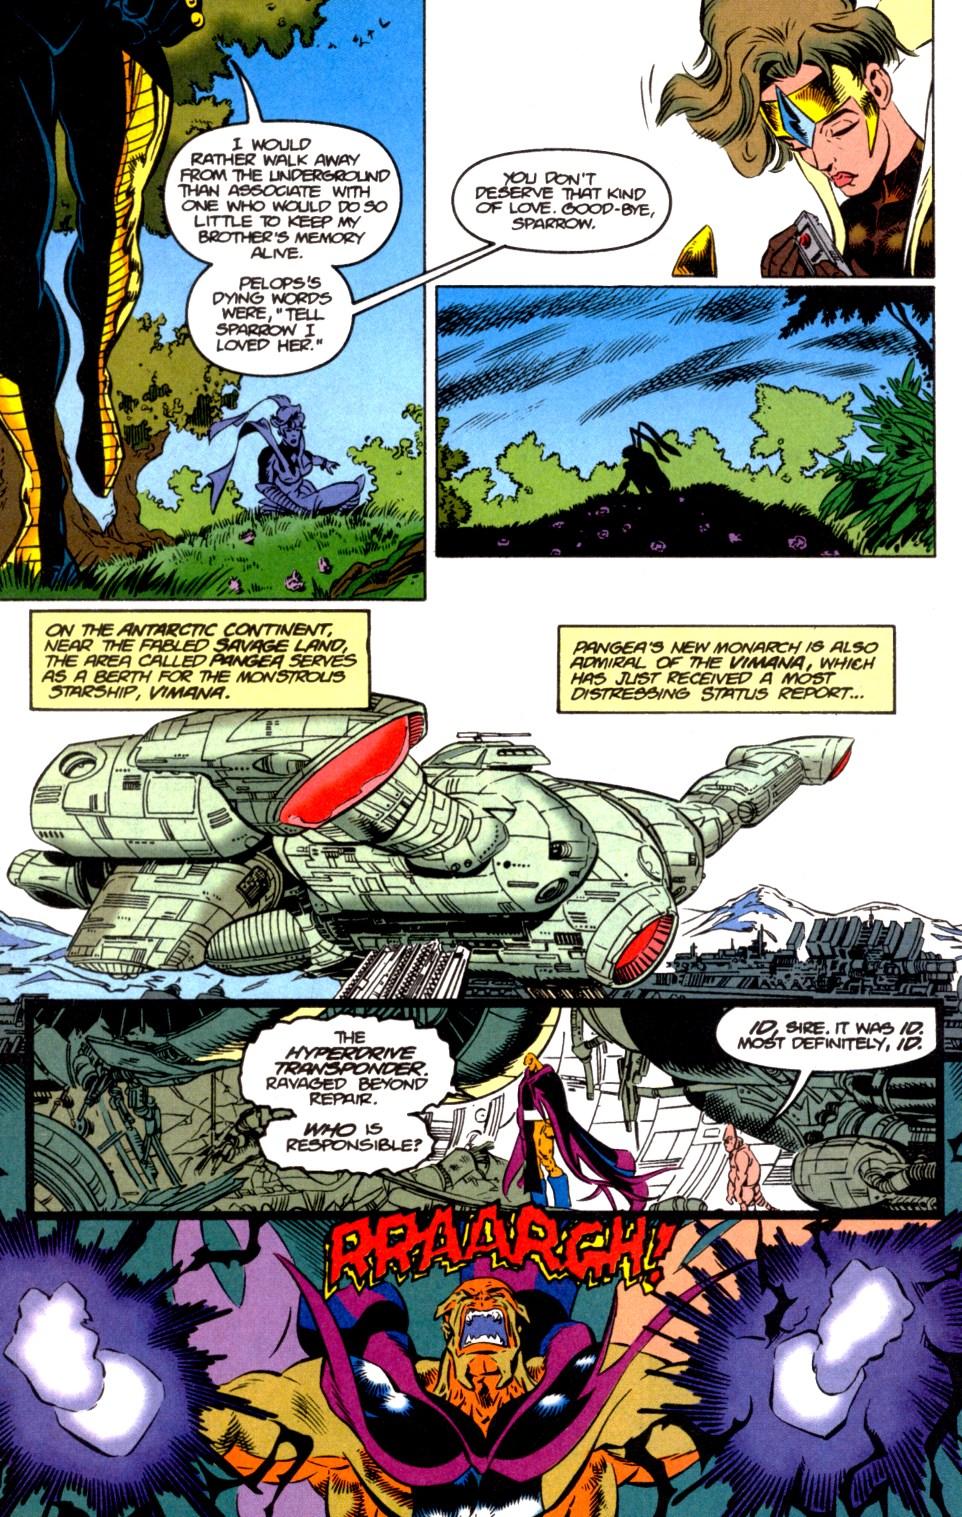 Read online Blackwulf comic -  Issue #6 - 11